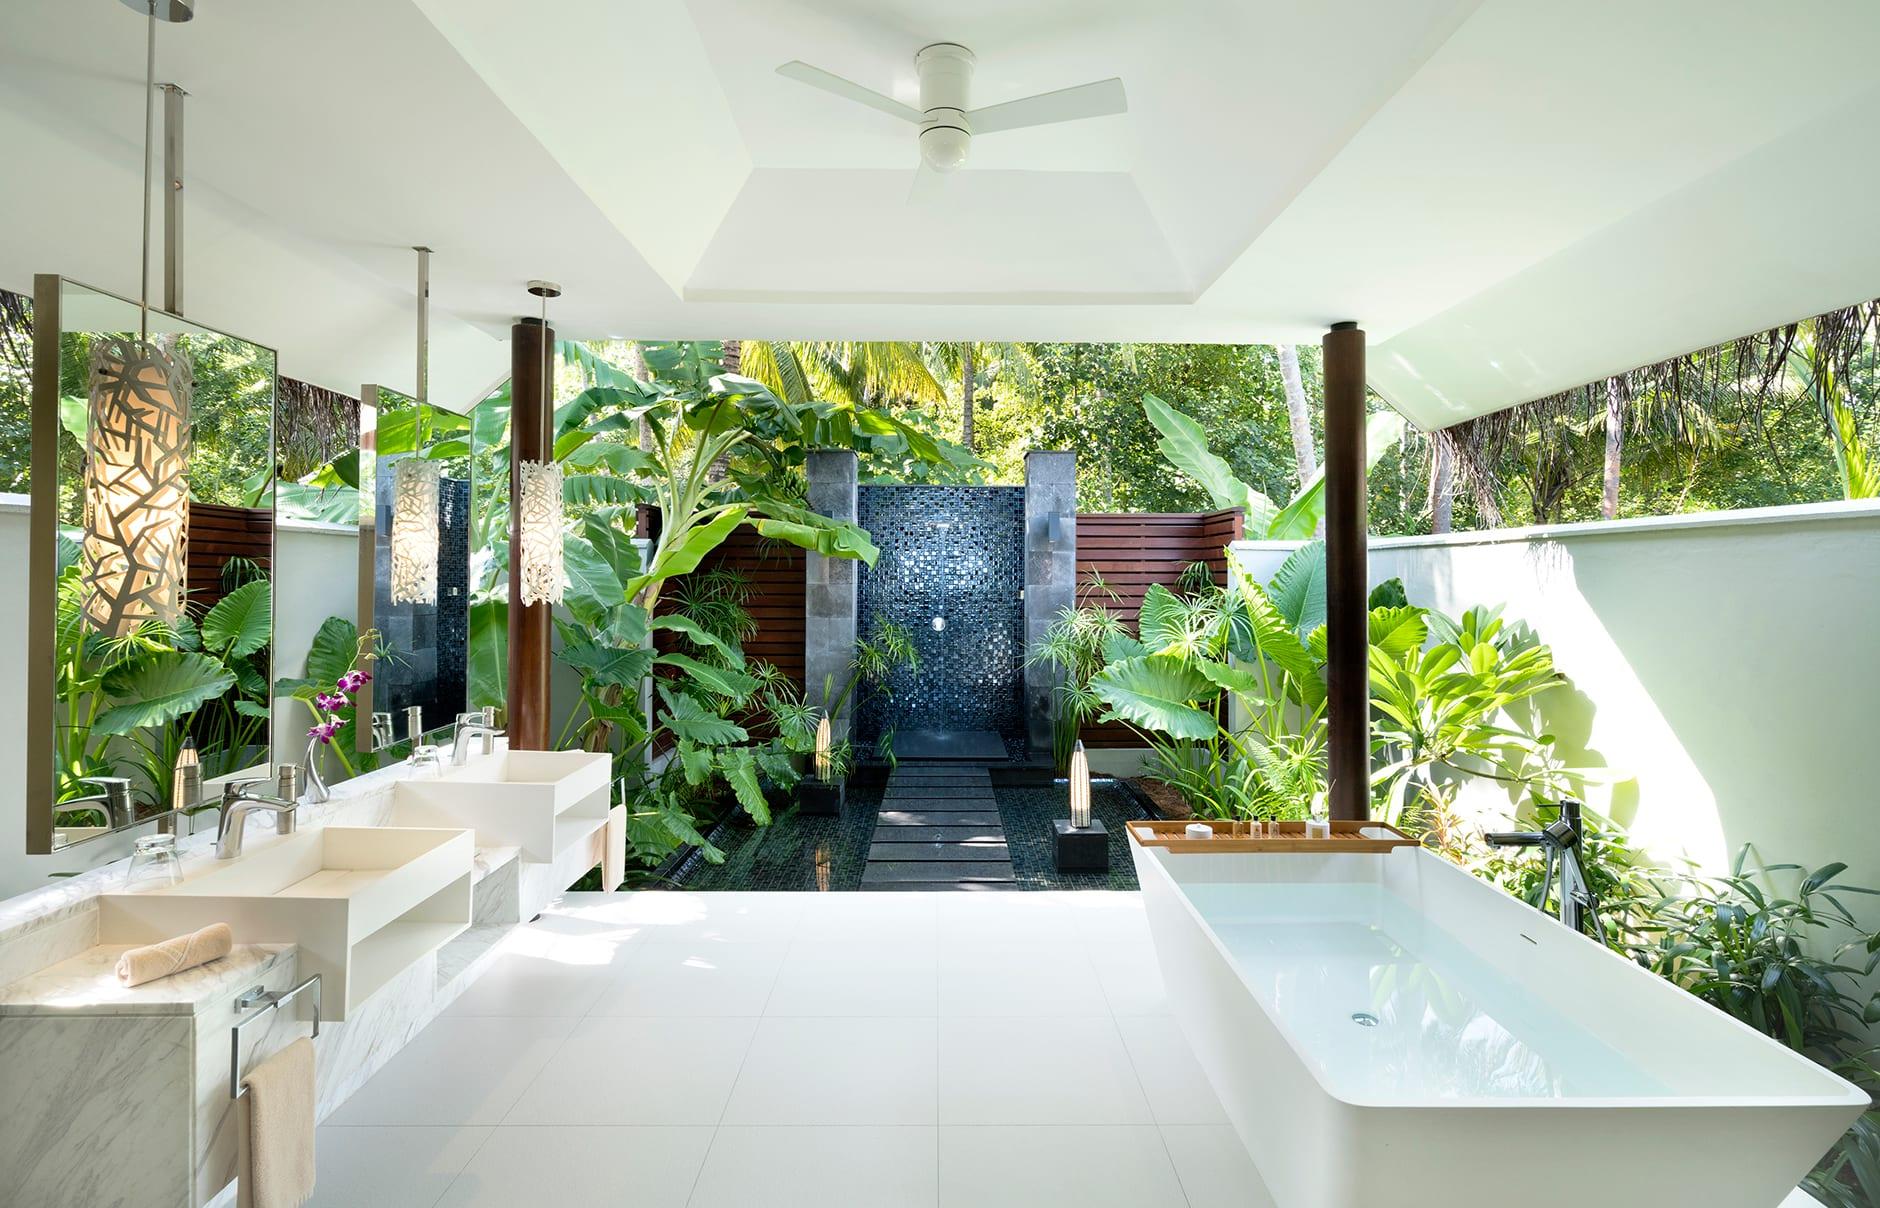 Niyama Private Islands Maldives. Hotel Review by TravelPlusStyle. Photo © NIYAMA